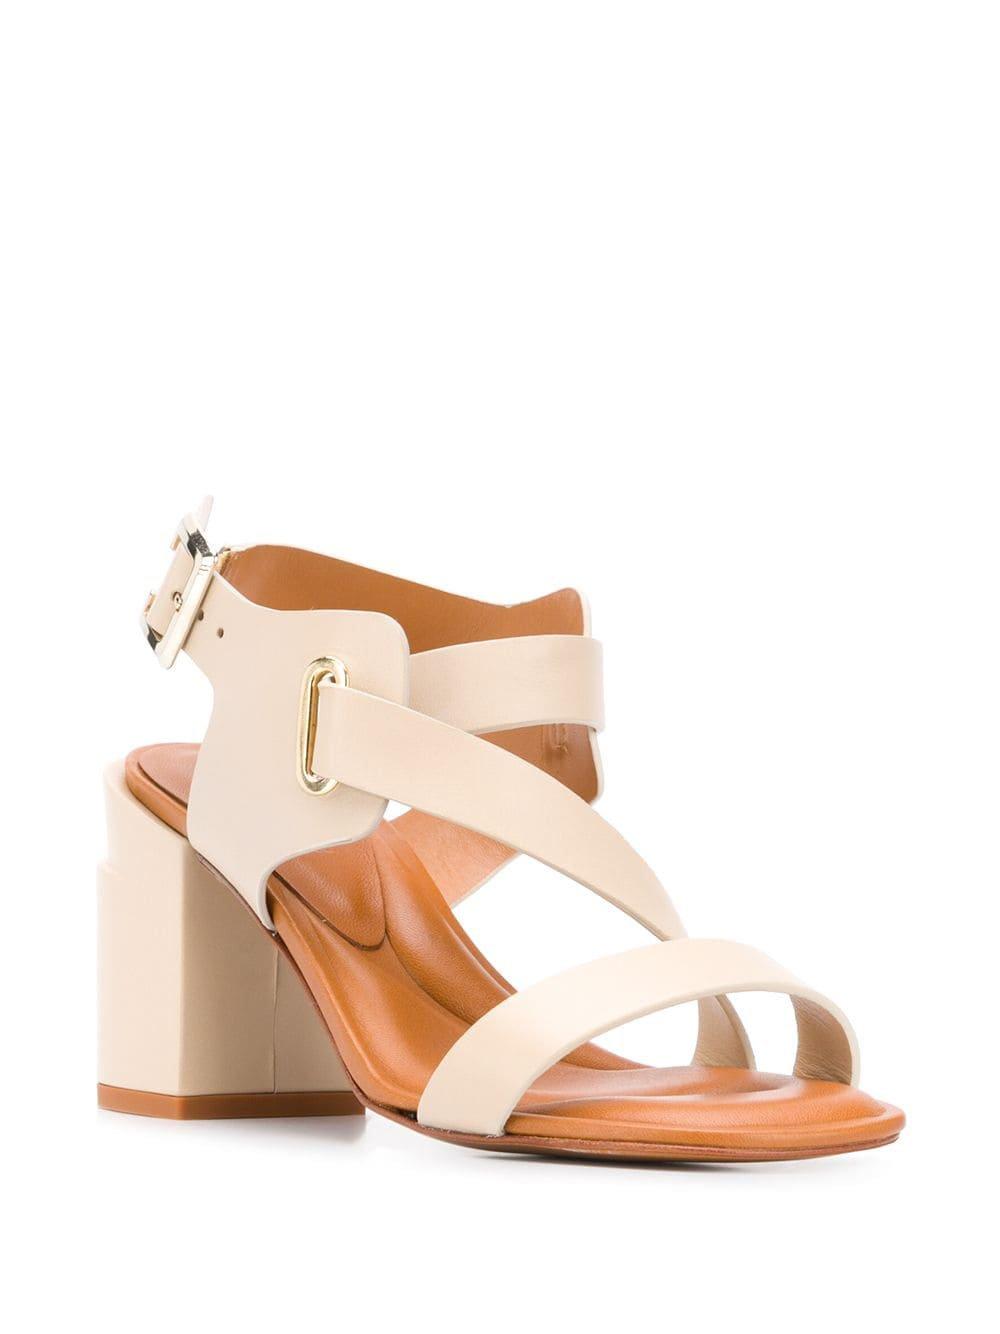 Clergerie Open Toe Sandals   Farfetch.com